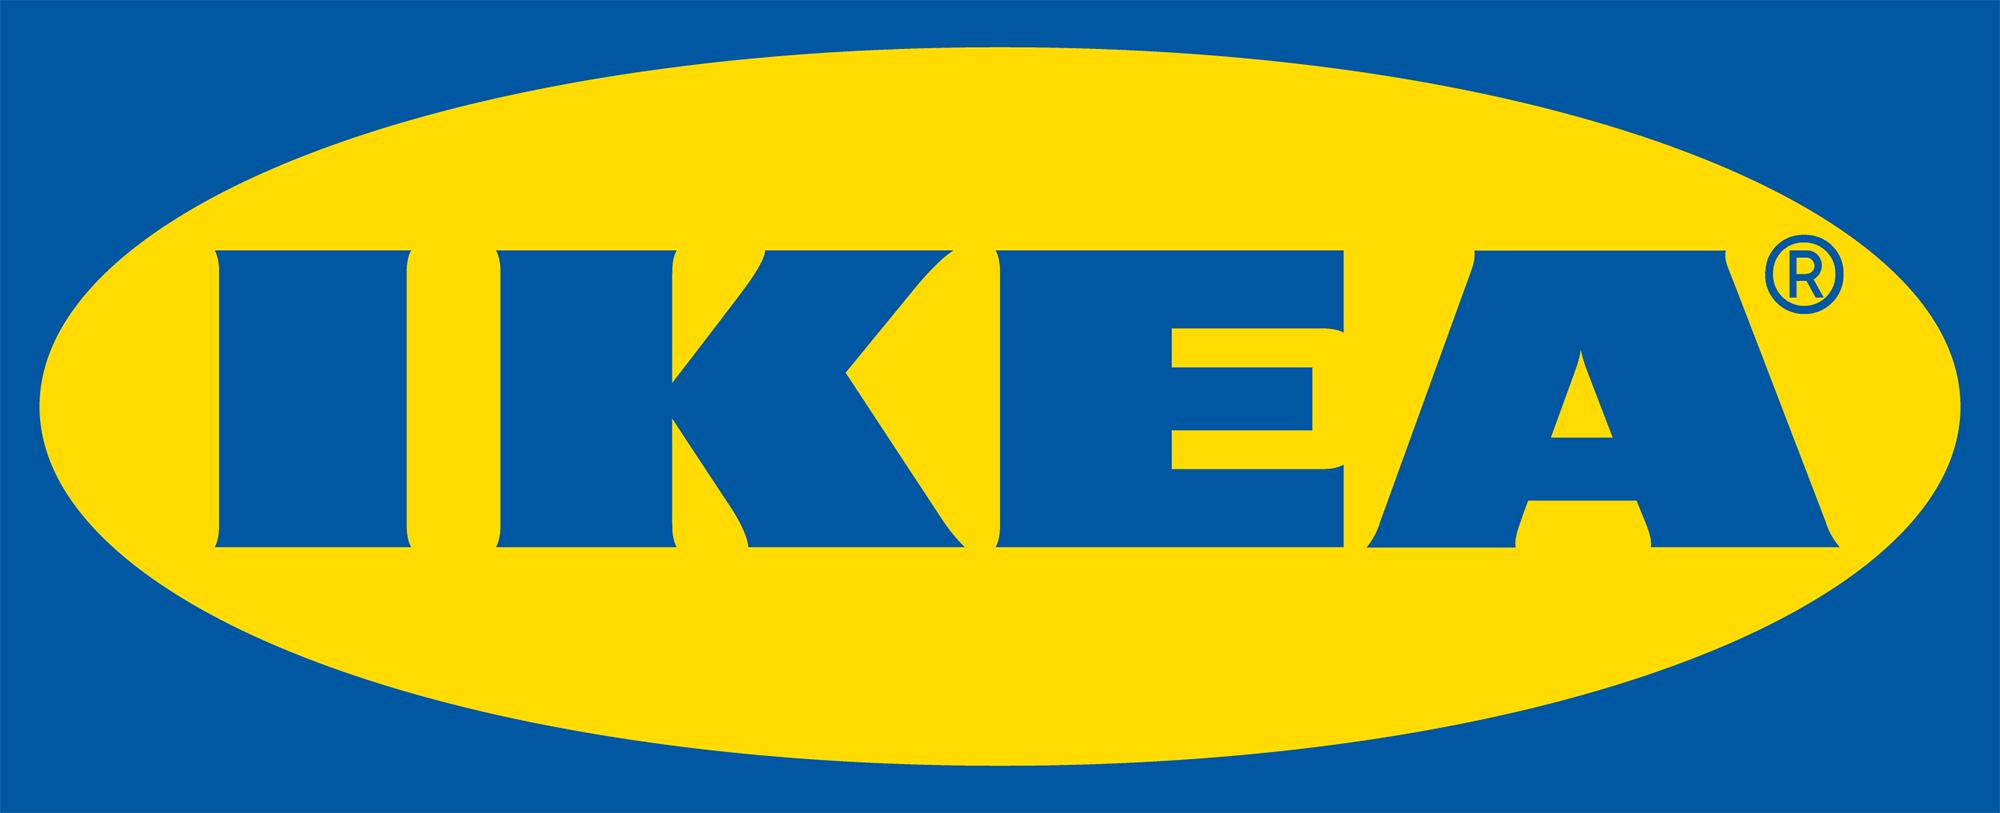 IKEA-logga.png